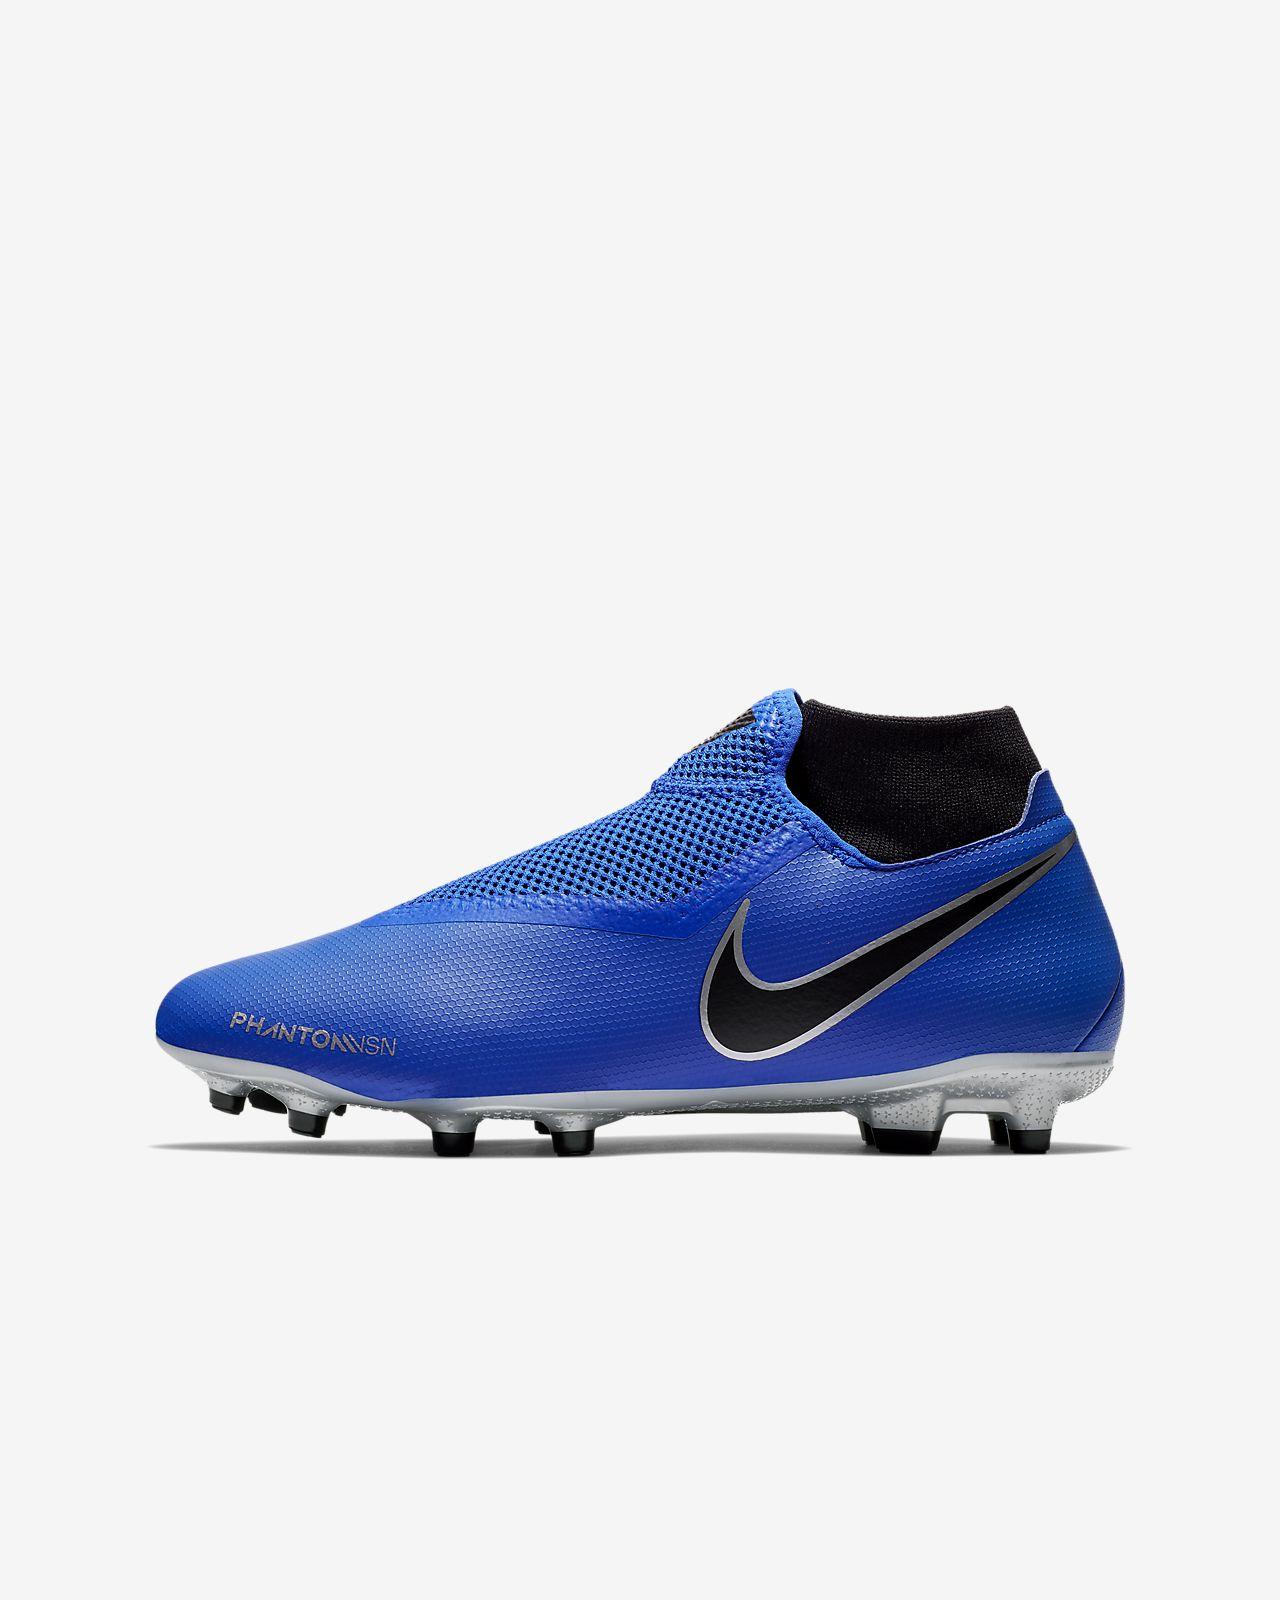 buy popular 9e0c9 d7f6c ... Chaussure de football à crampons multi-surfaces Nike Phantom Vision  Academy Dynamic Fit MG